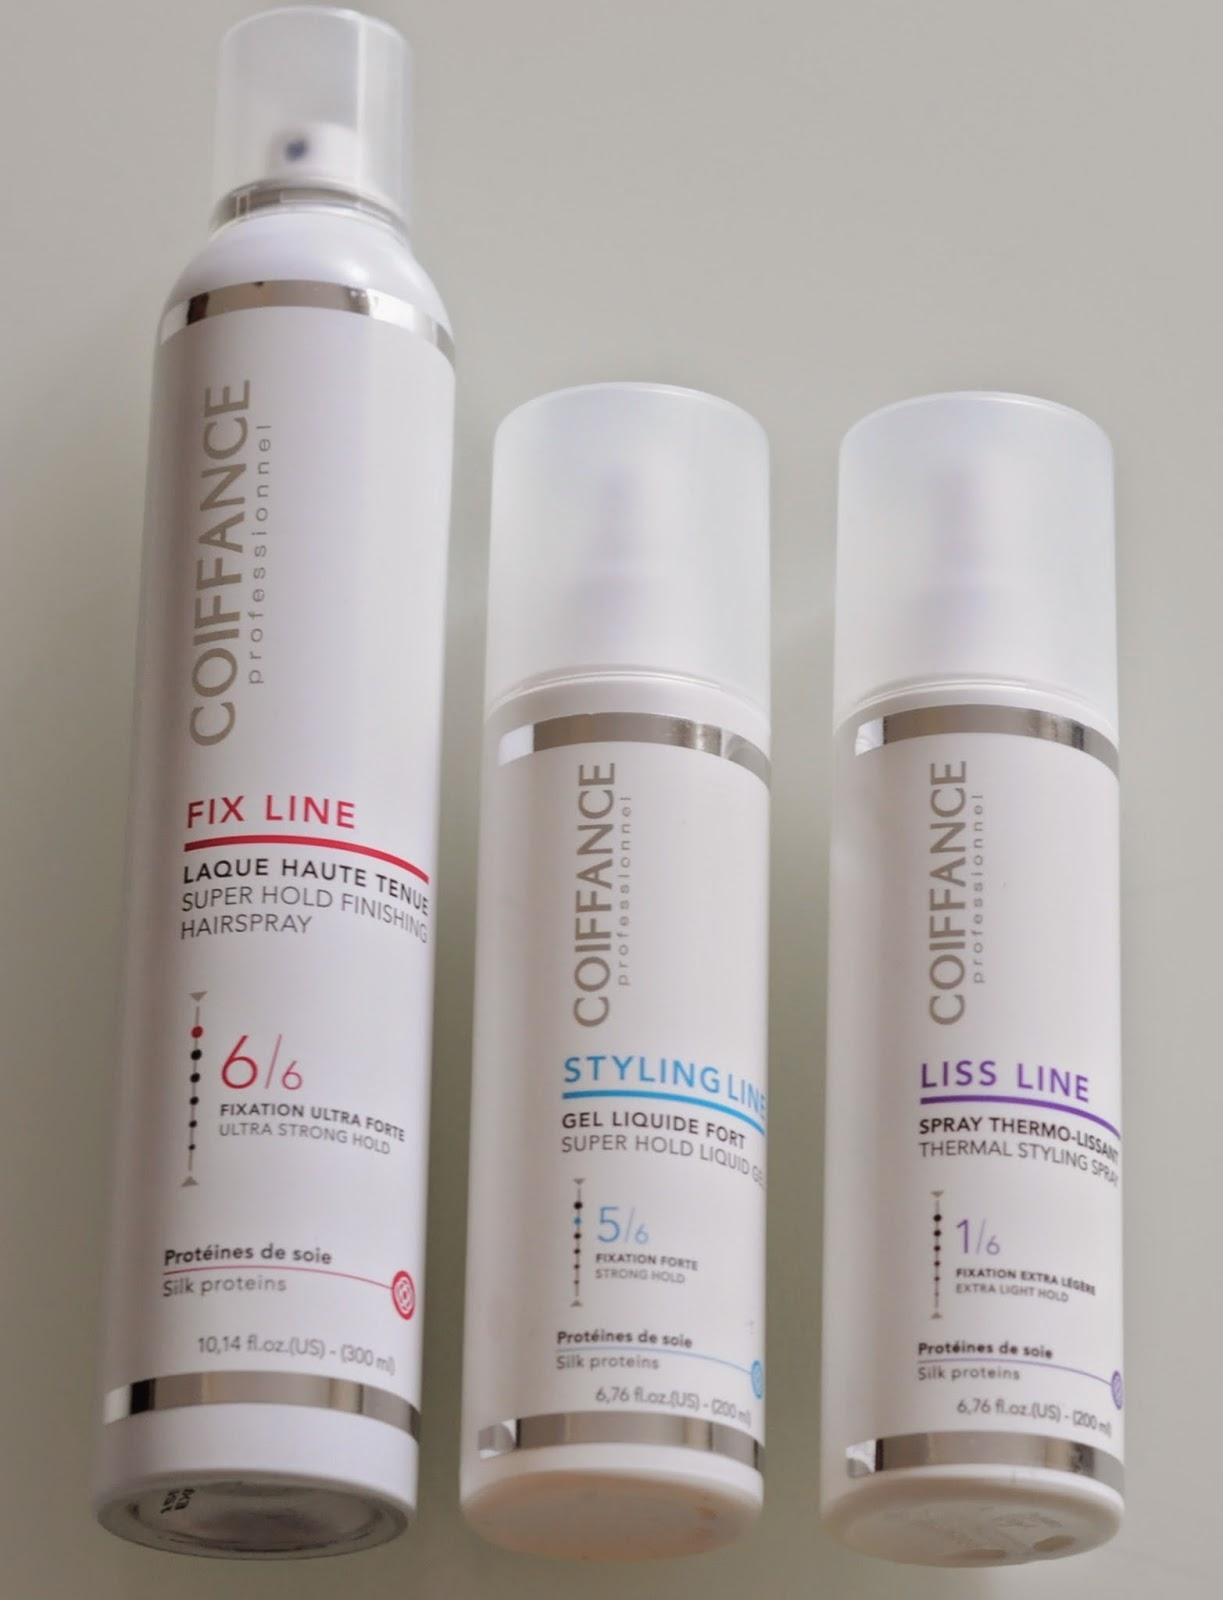 Produits Coiffance: gel liquide fort, laque haute tenue, spray thermo-lissant